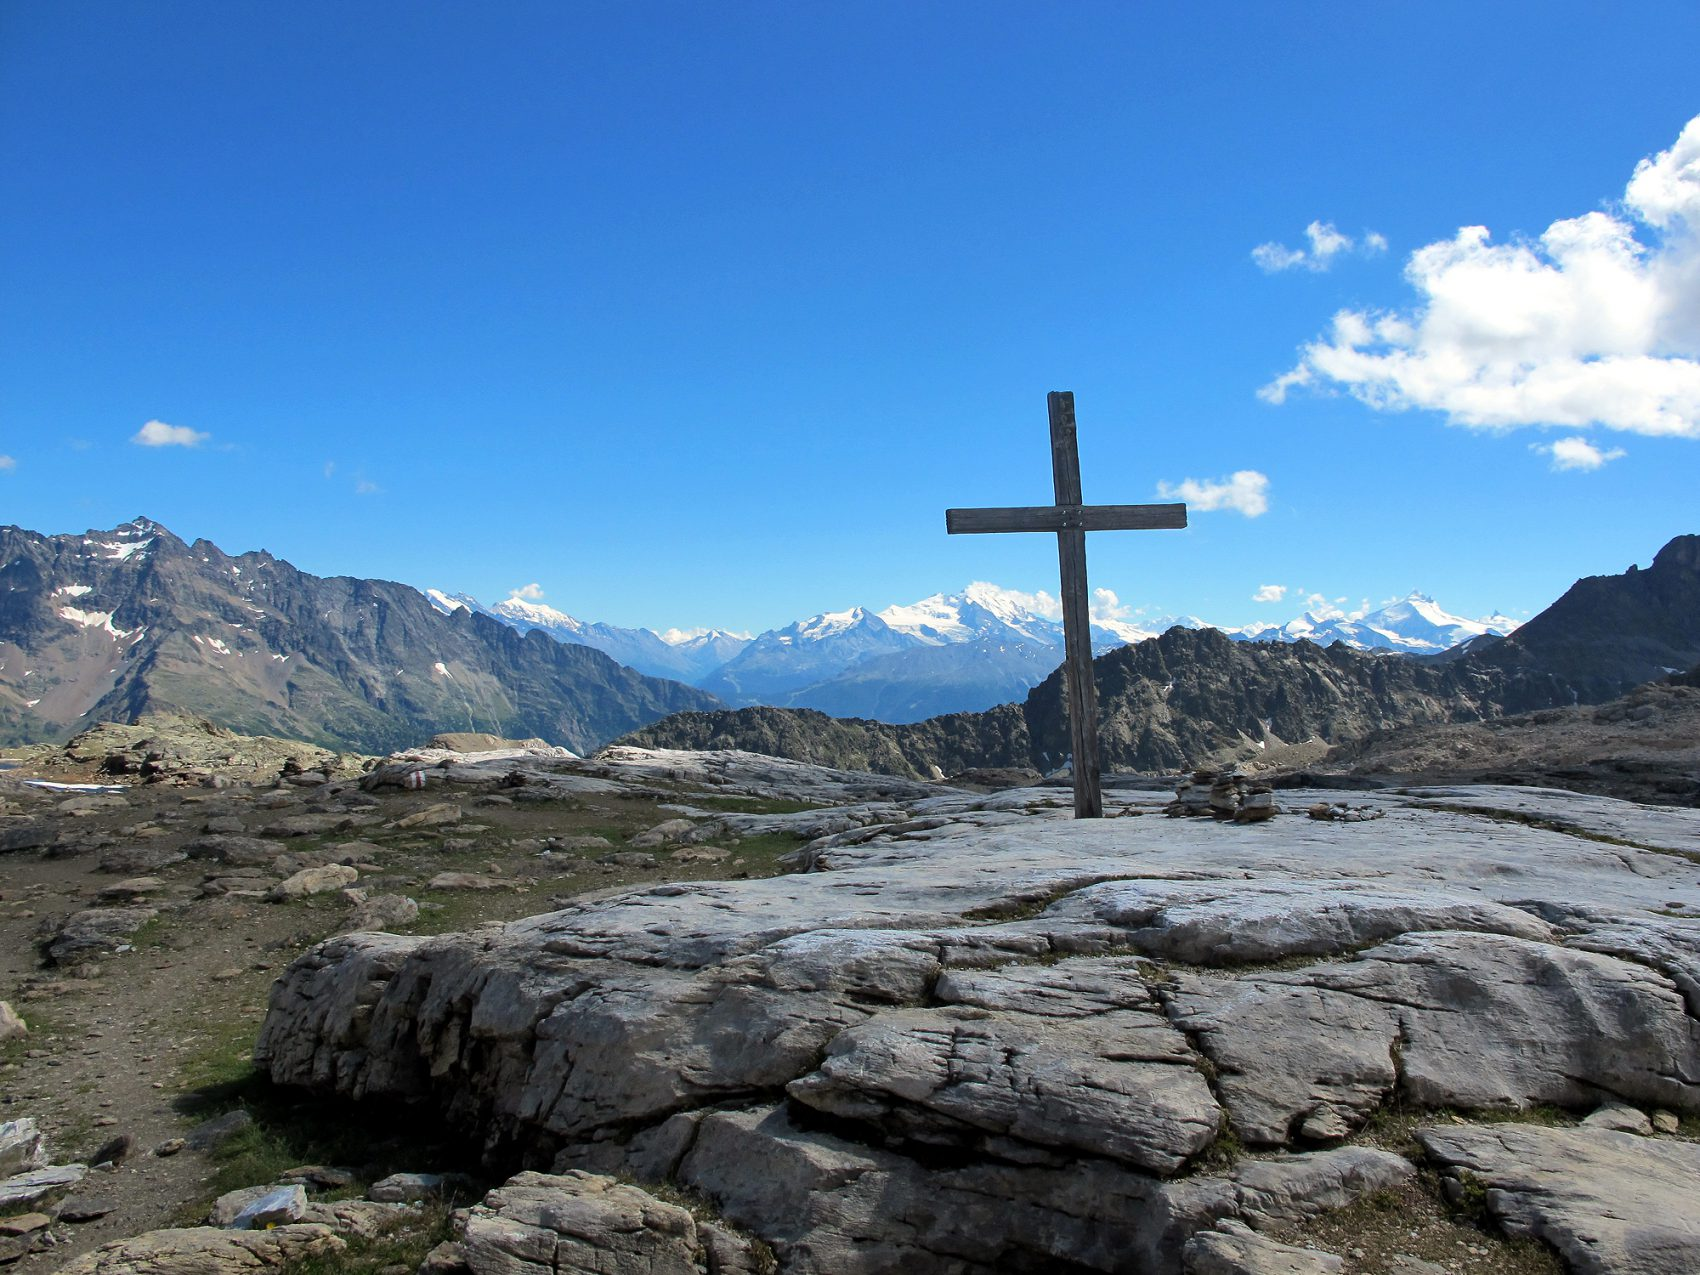 Gipfel am Lötschenpass